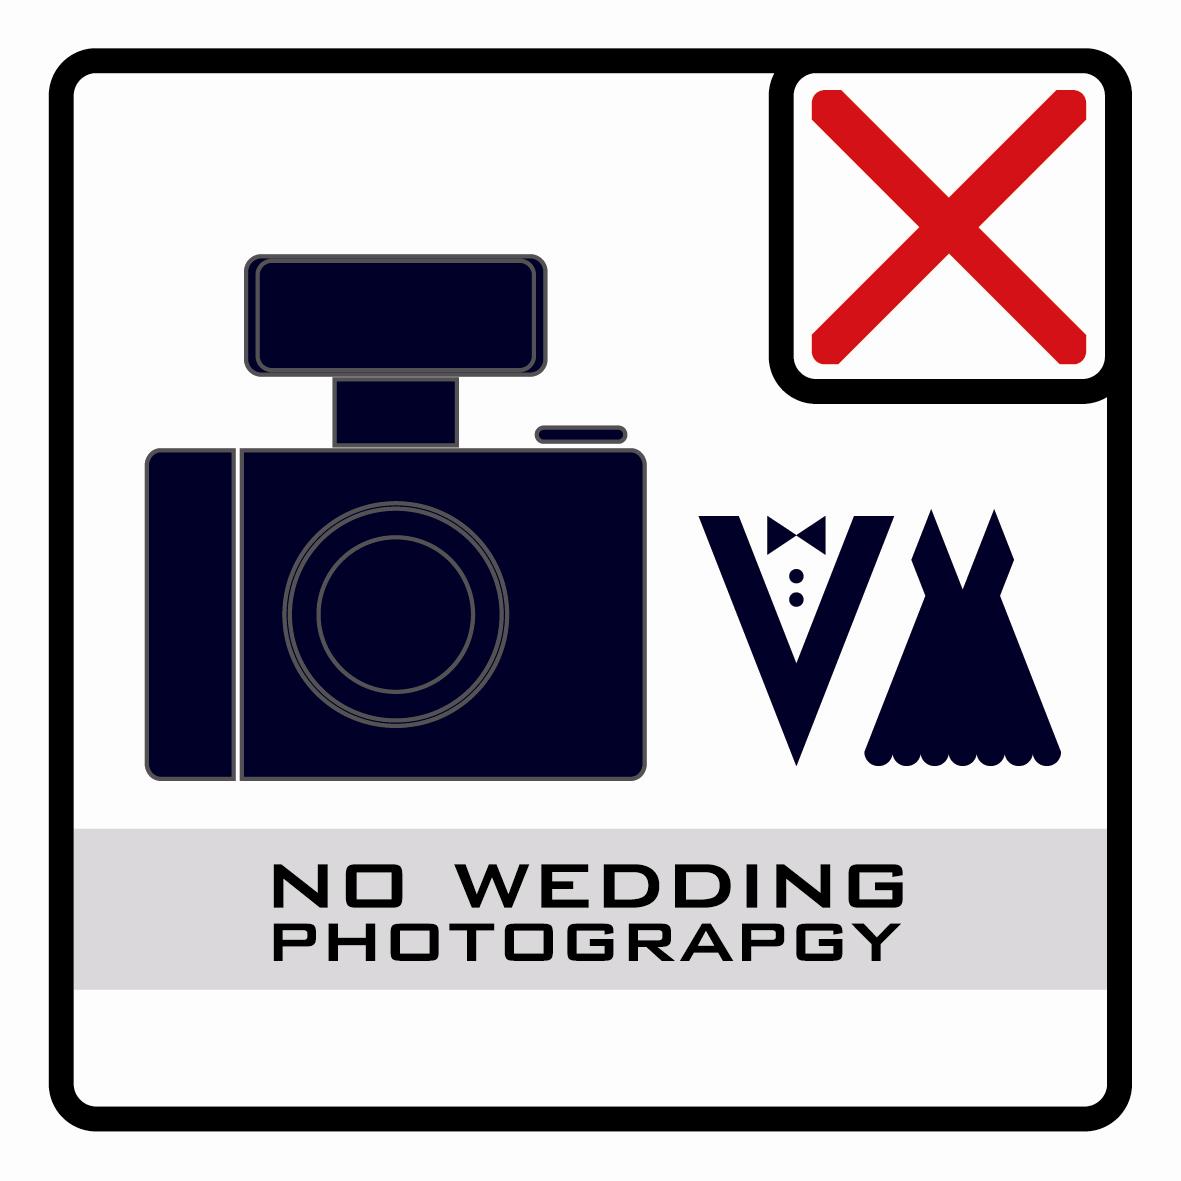 【icon】禁止婚紗攝影